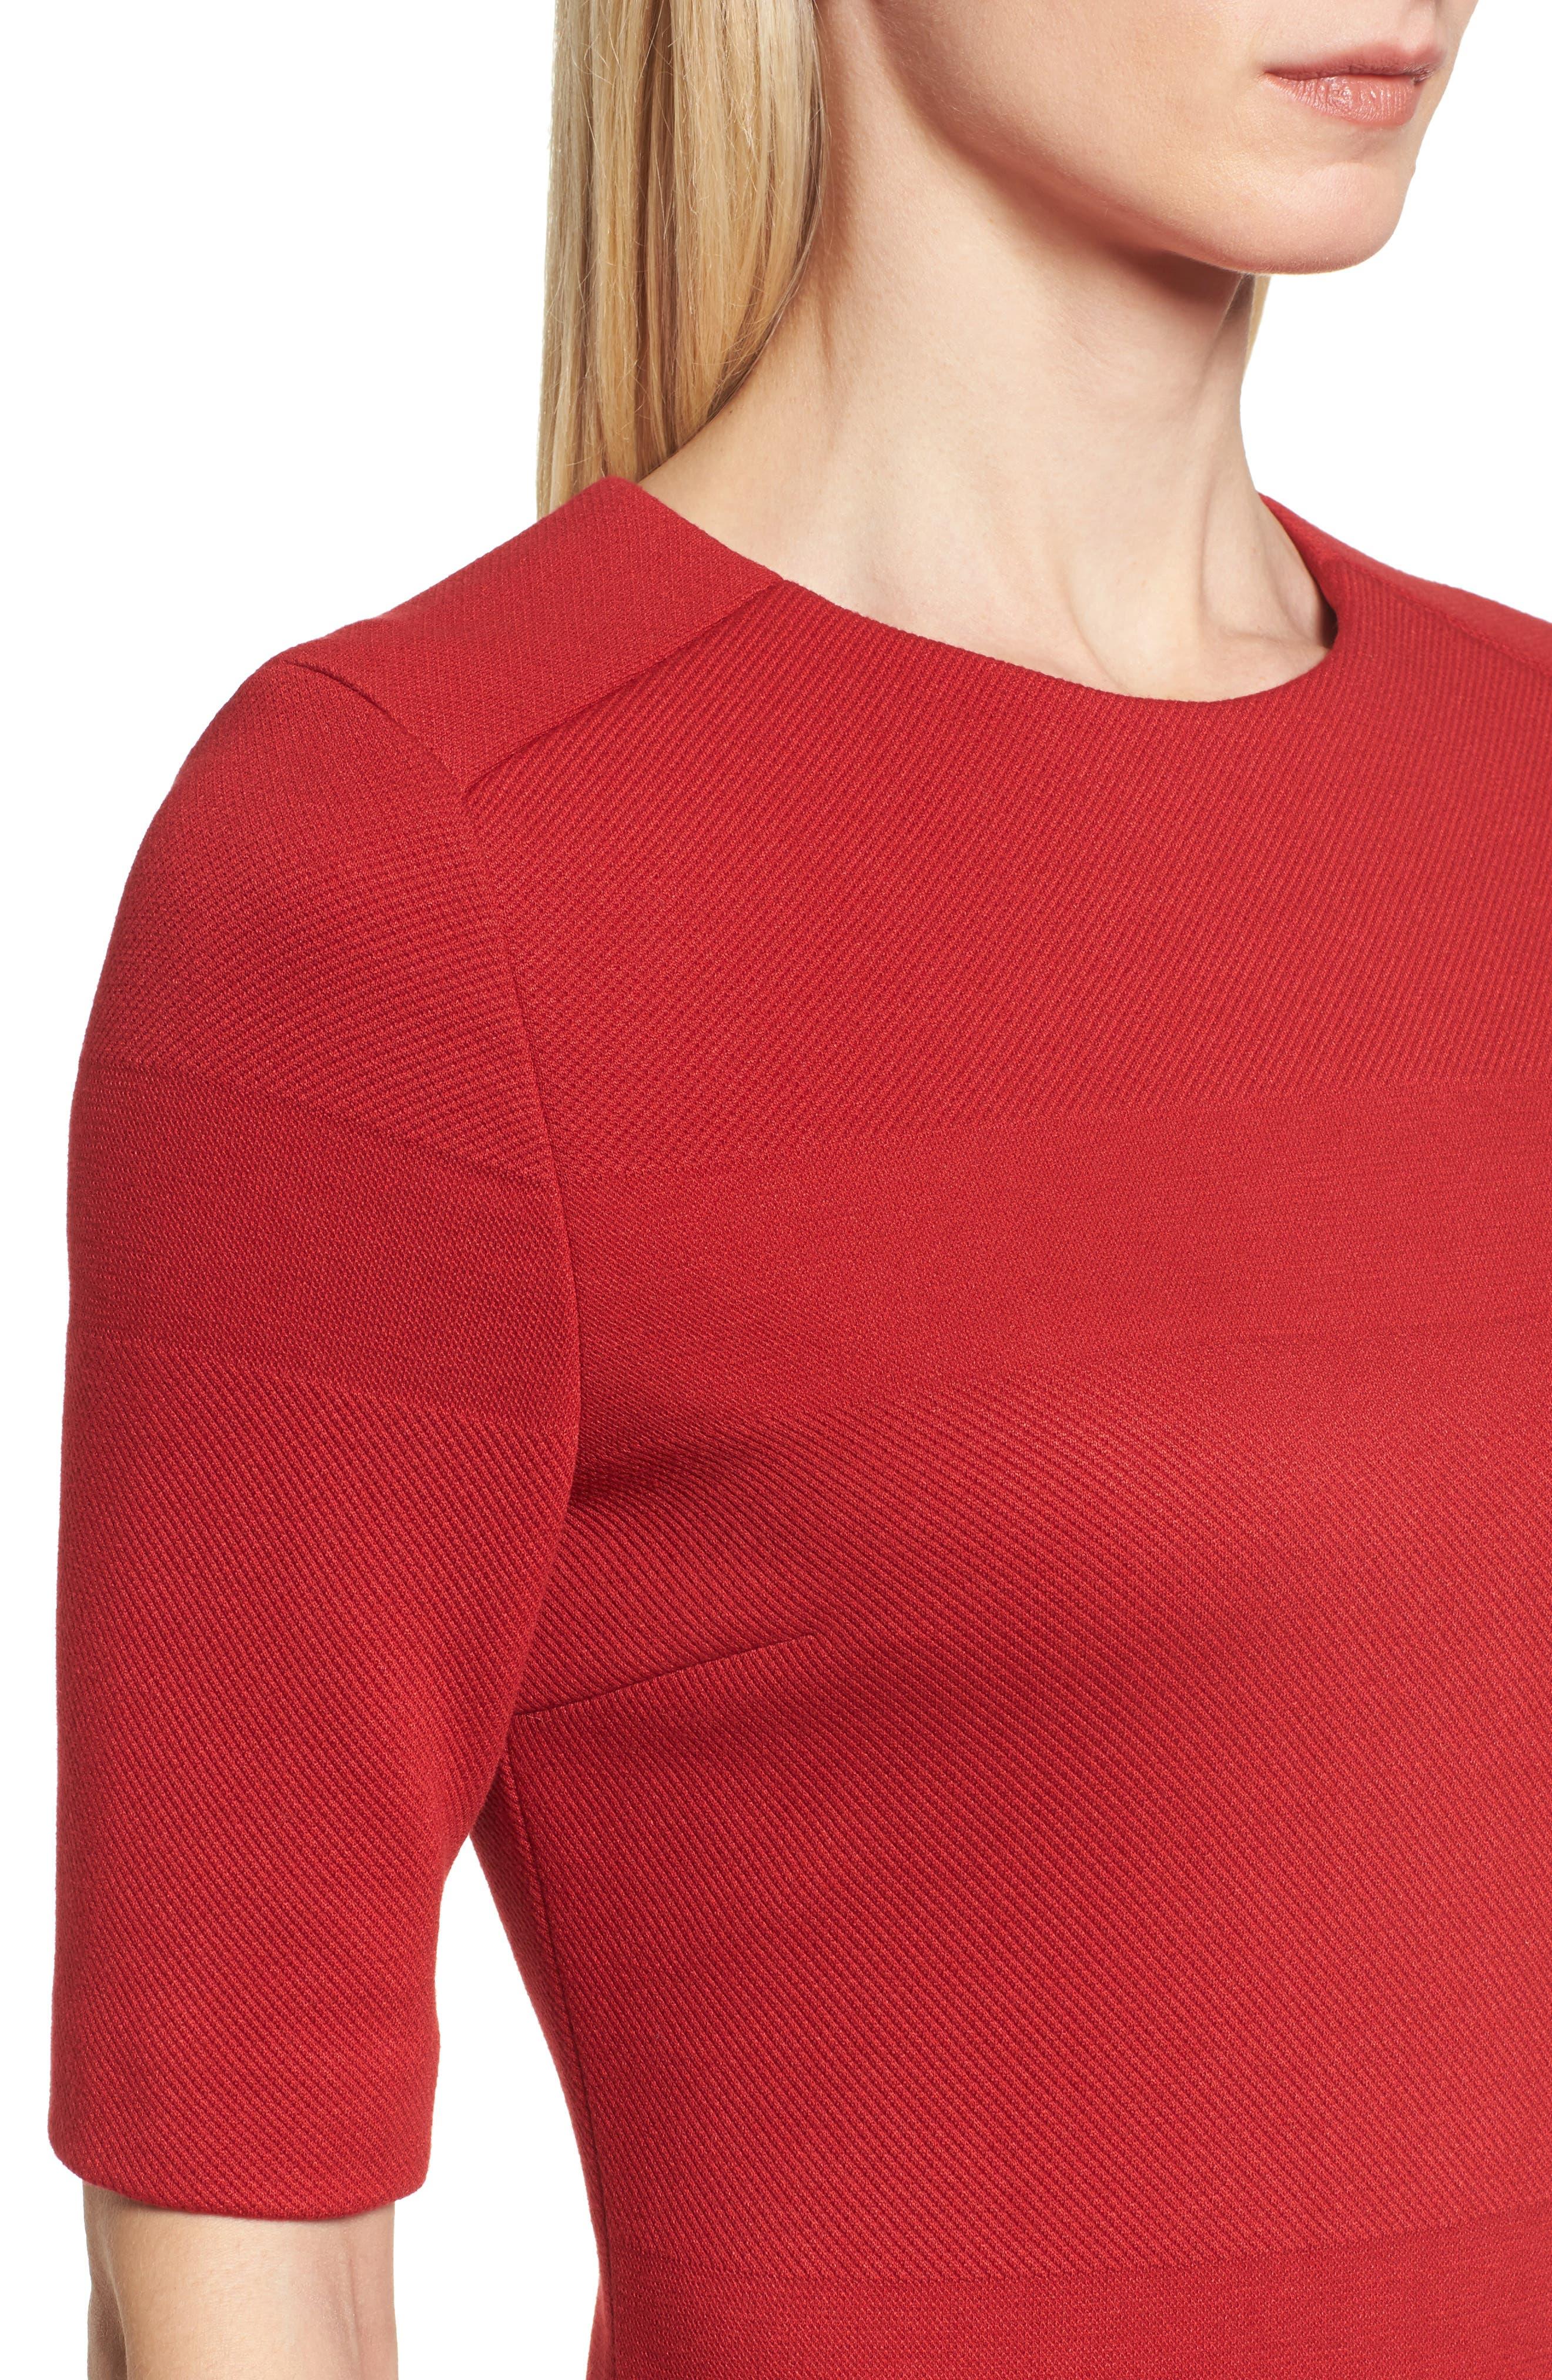 Hibela Tonal Stripe Dress,                             Alternate thumbnail 4, color,                             Crimson Red